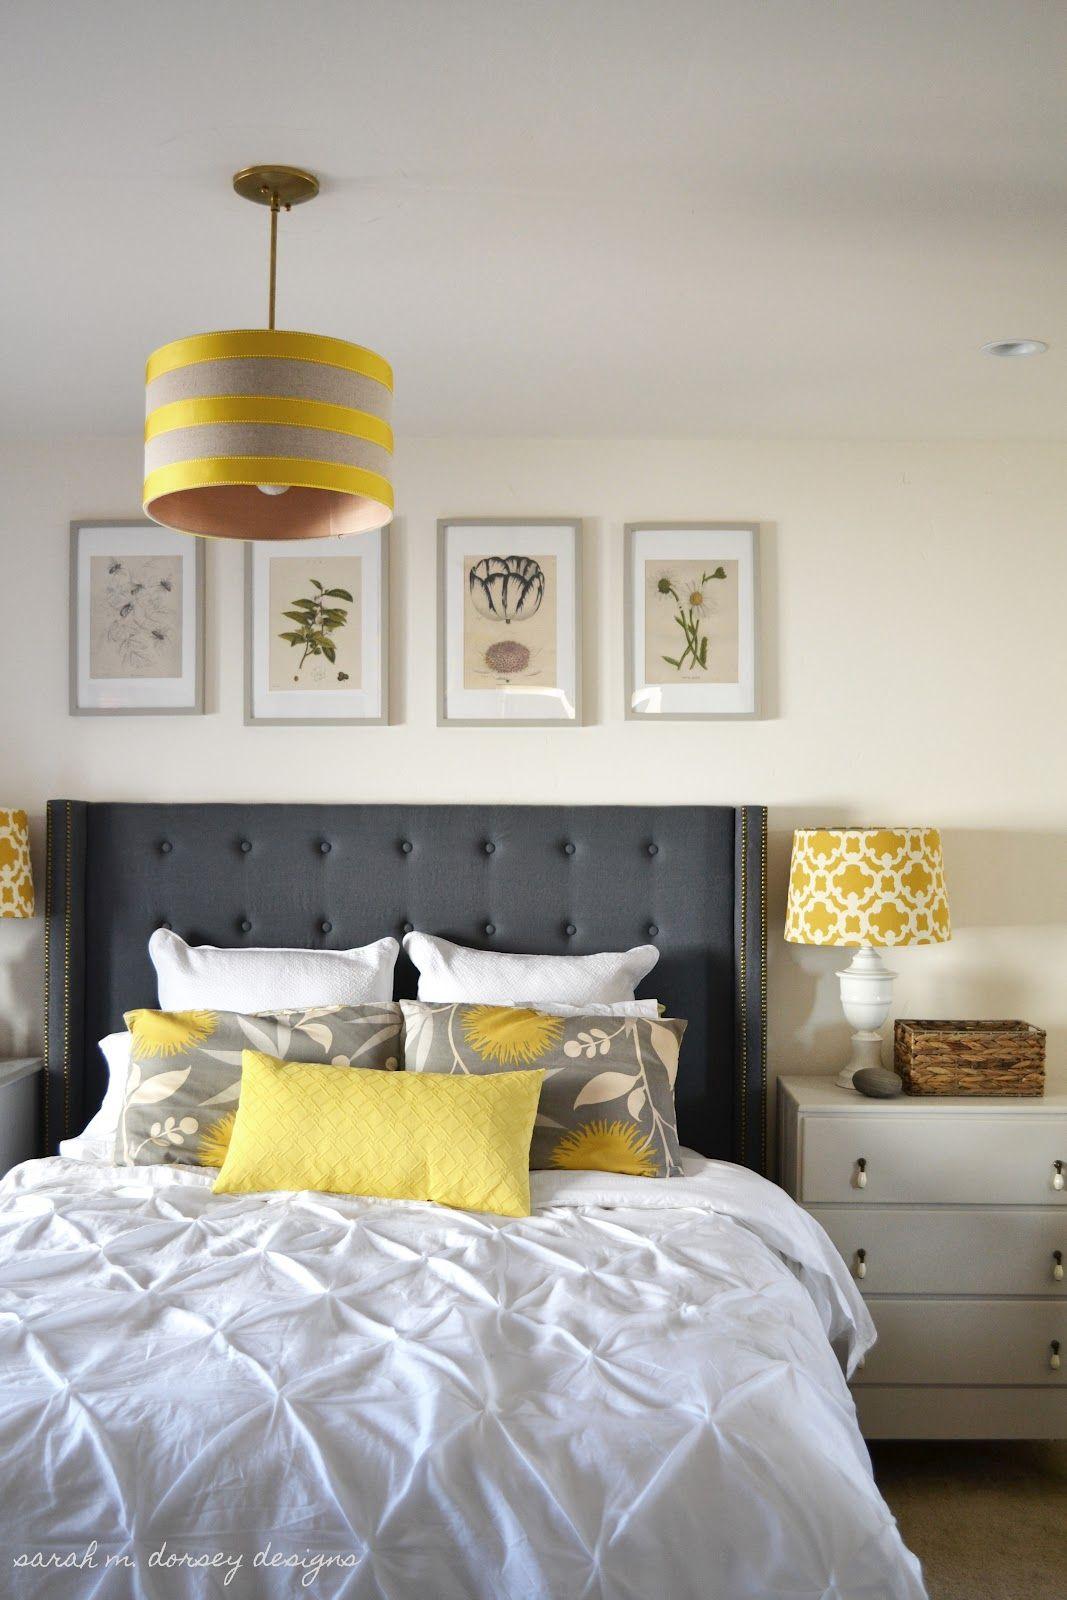 Best Sarah M Dorsey Designs Art For Above The Headboard 640 x 480